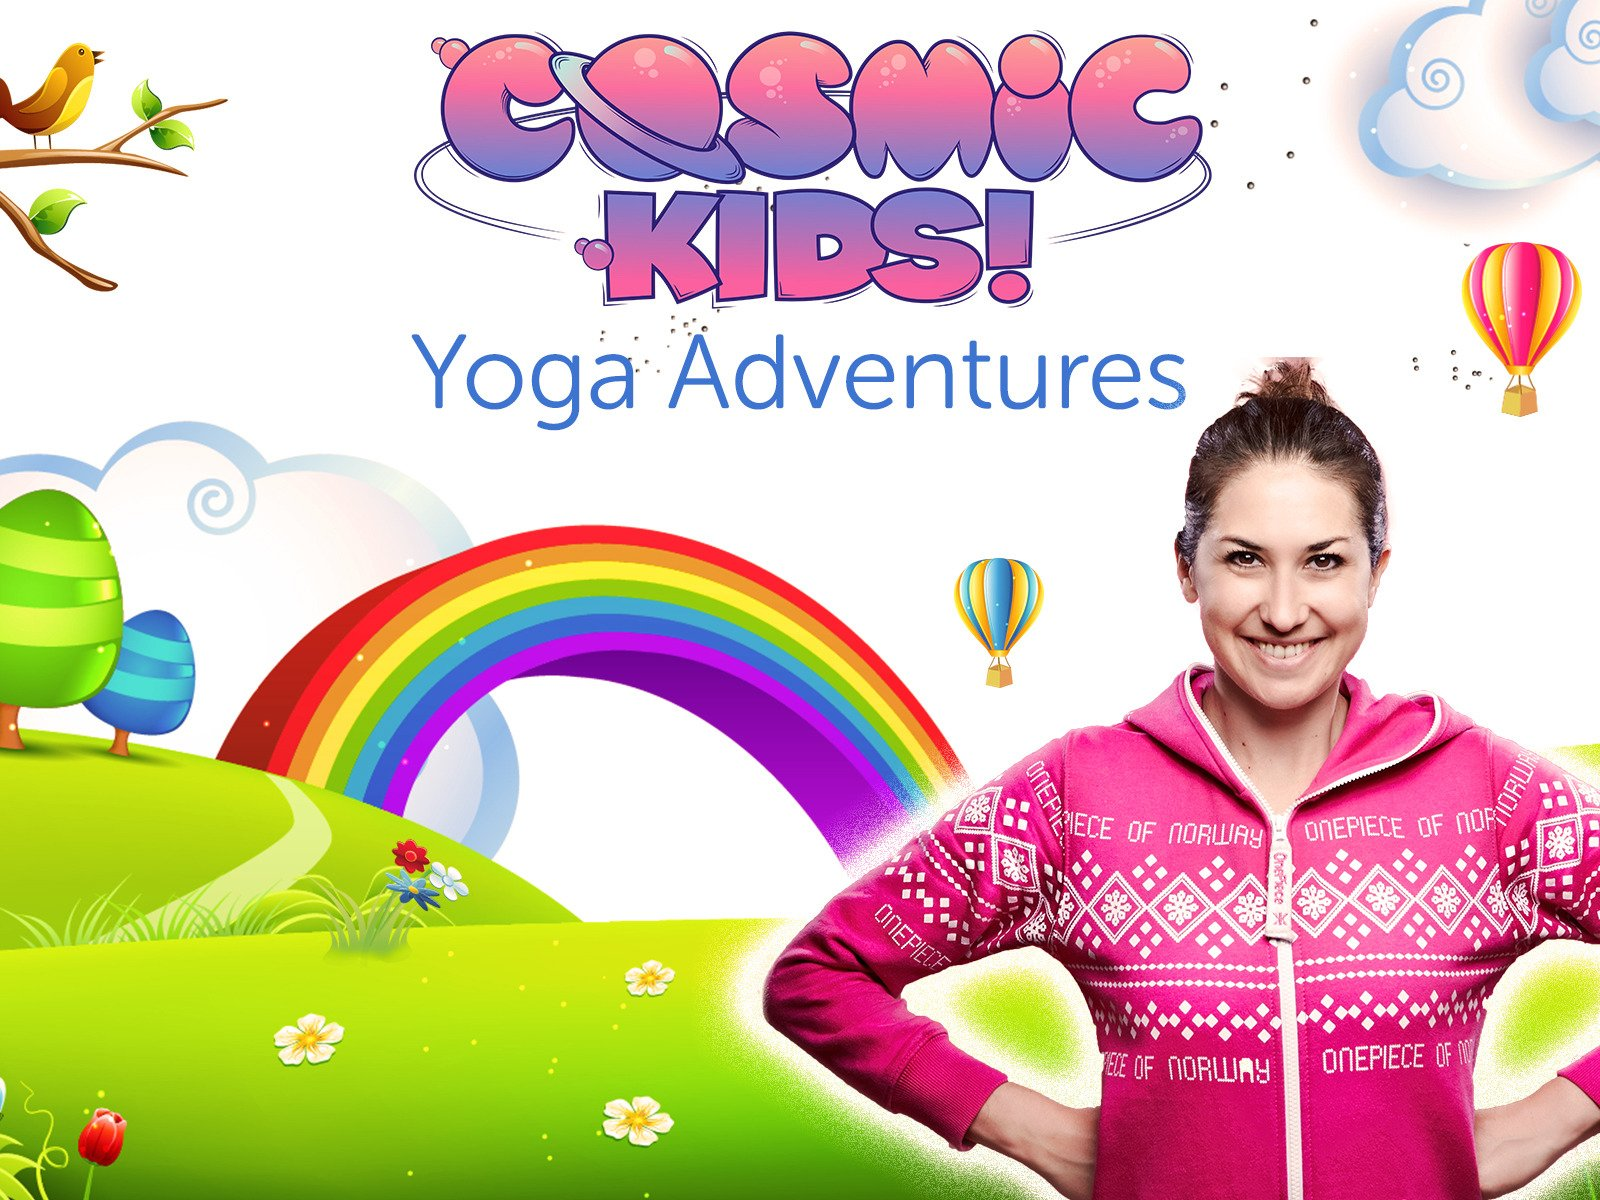 Watch Cosmic Kids Yoga Adventures On Amazon Prime Video Uk Newonamzprimeuk